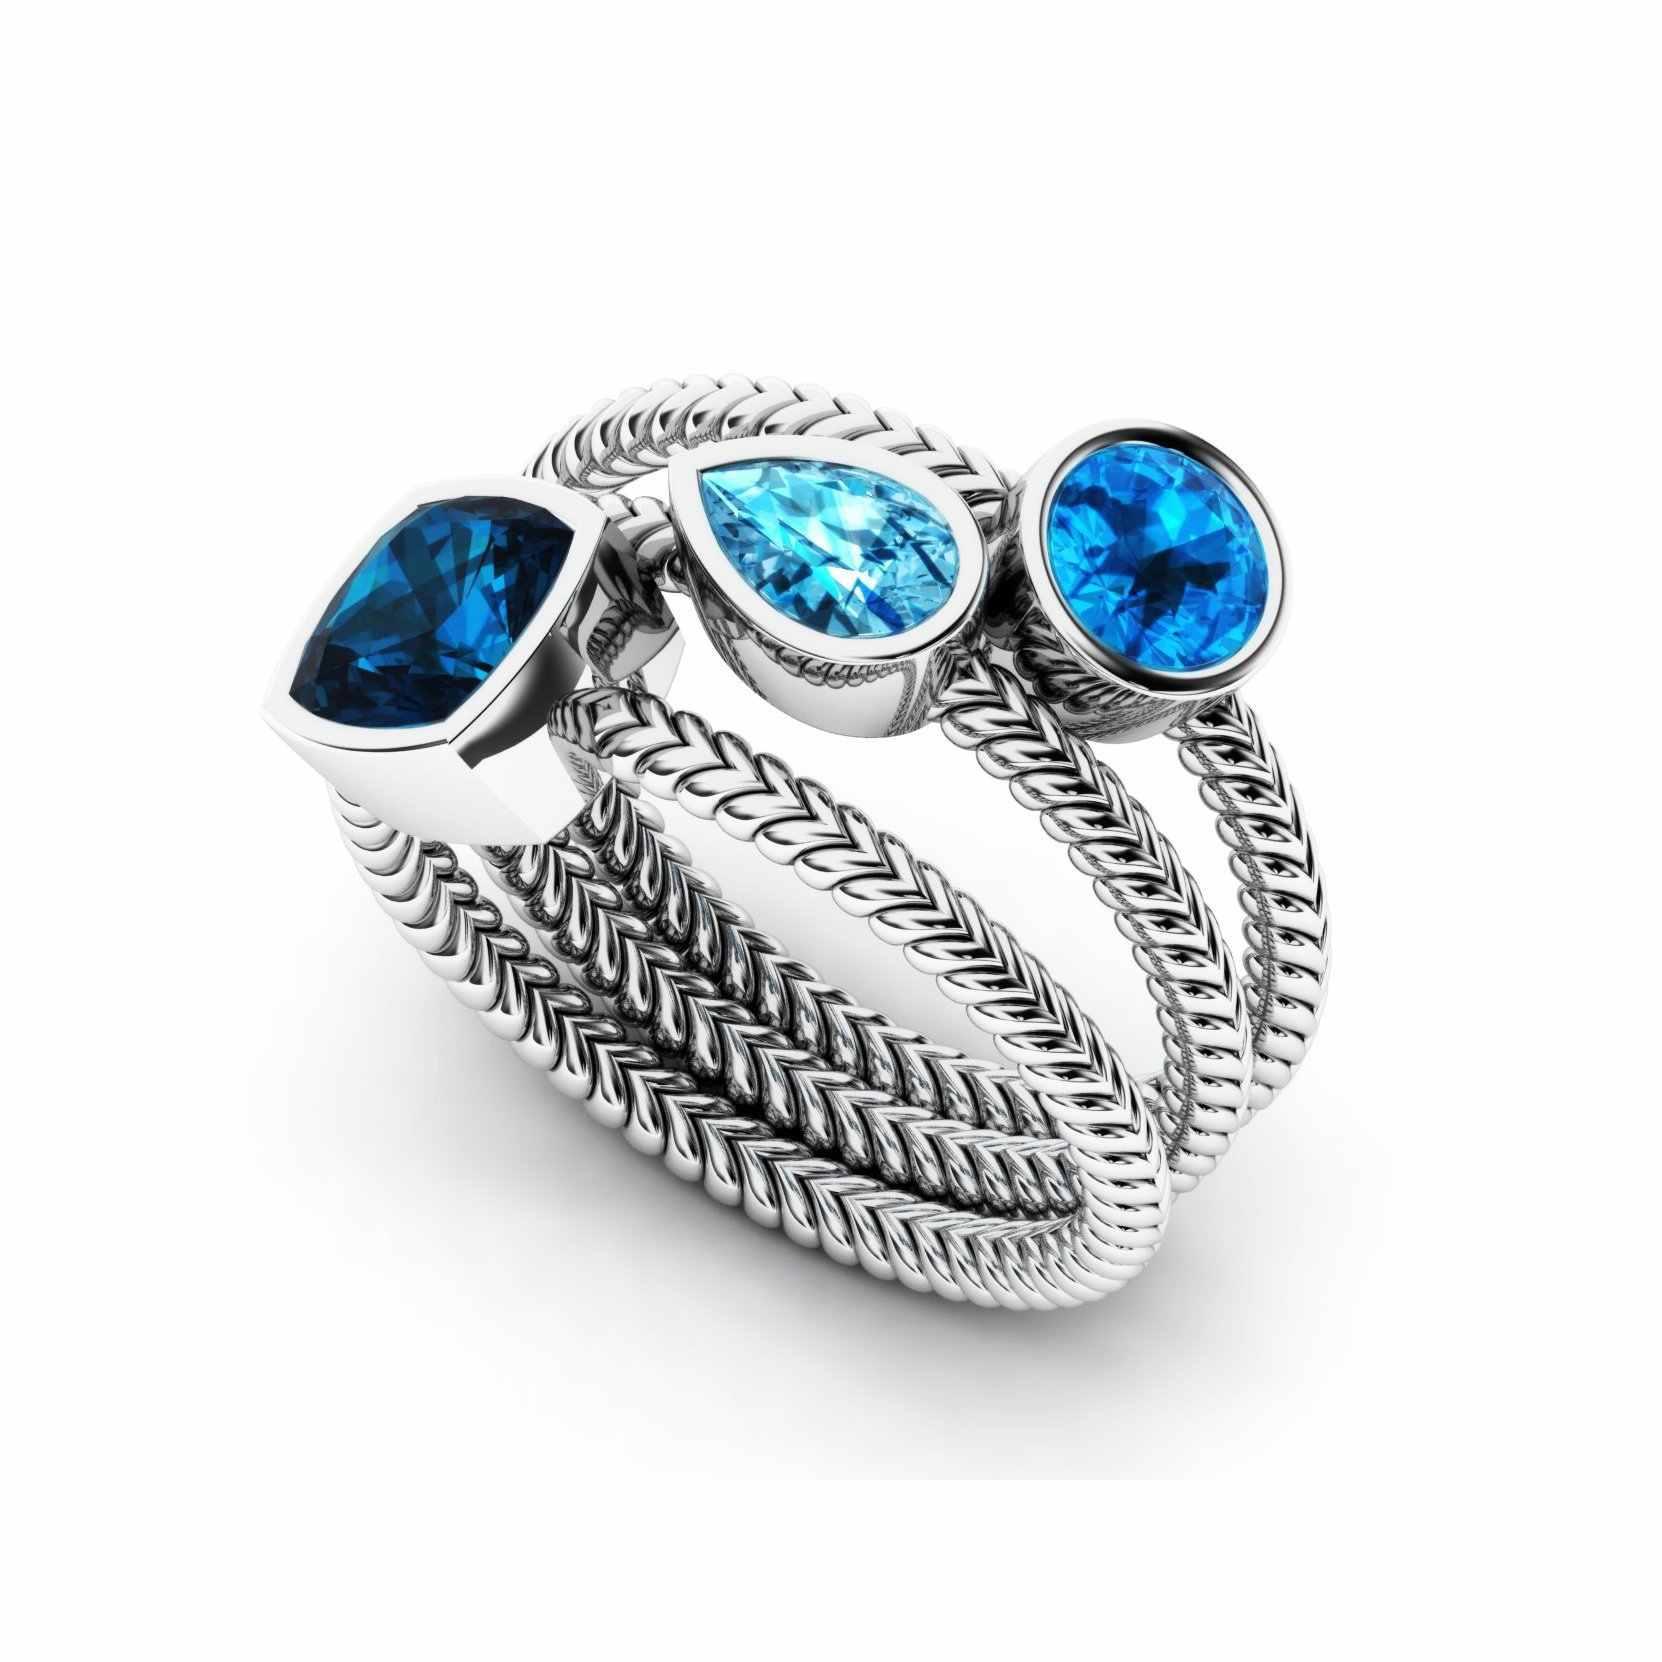 3-in-1 สัญญาแหวนชุด Silver Alloy AAAA Zircon CZ ปาร์ตี้แหวนสำหรับชาย finger เครื่องประดับหินธรรมชาติ